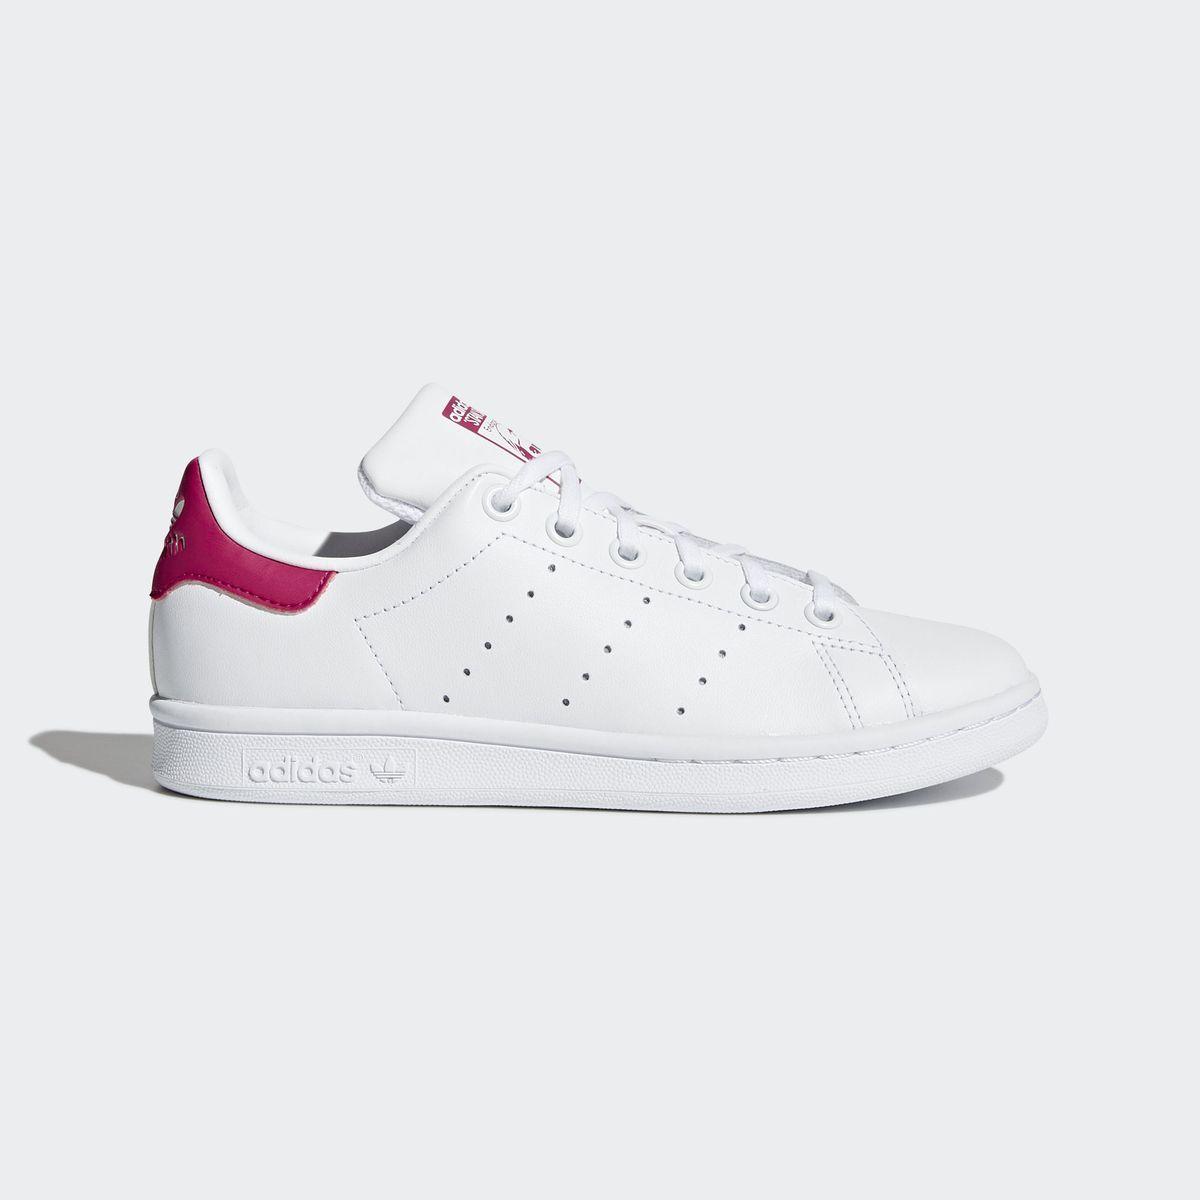 originals smith stan adidas chaussure 40 taille eWI92bDEHY